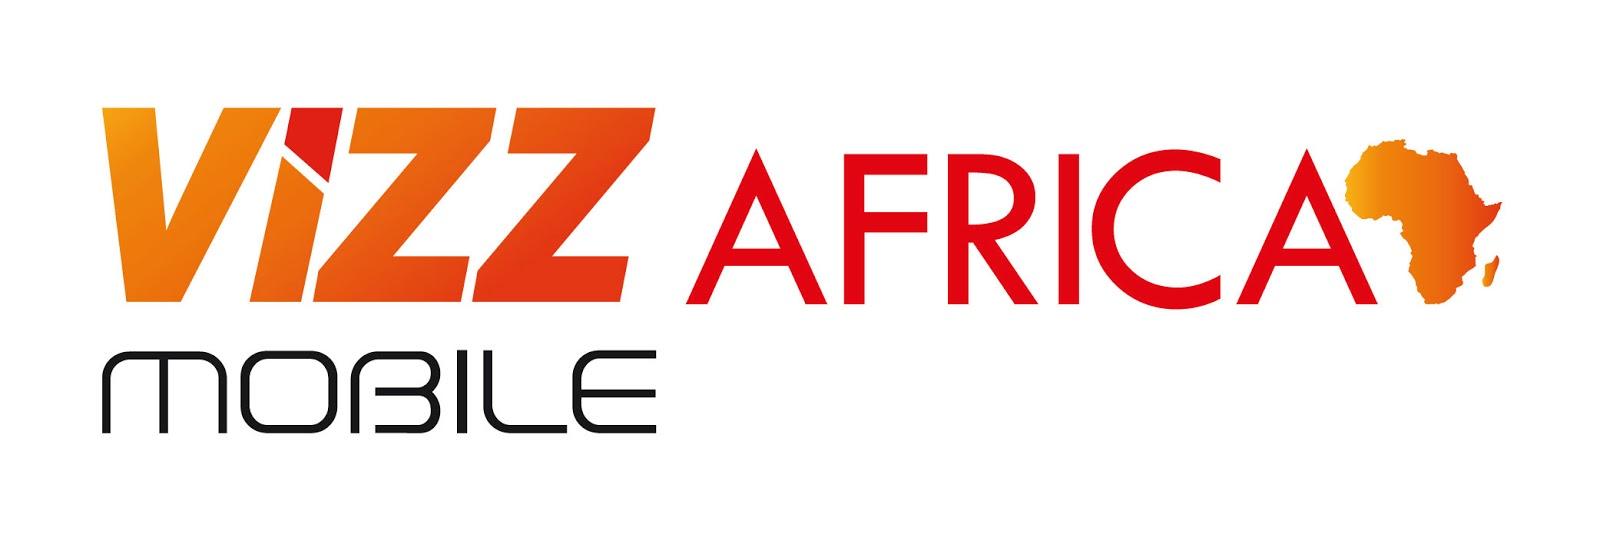 Vizz Africa